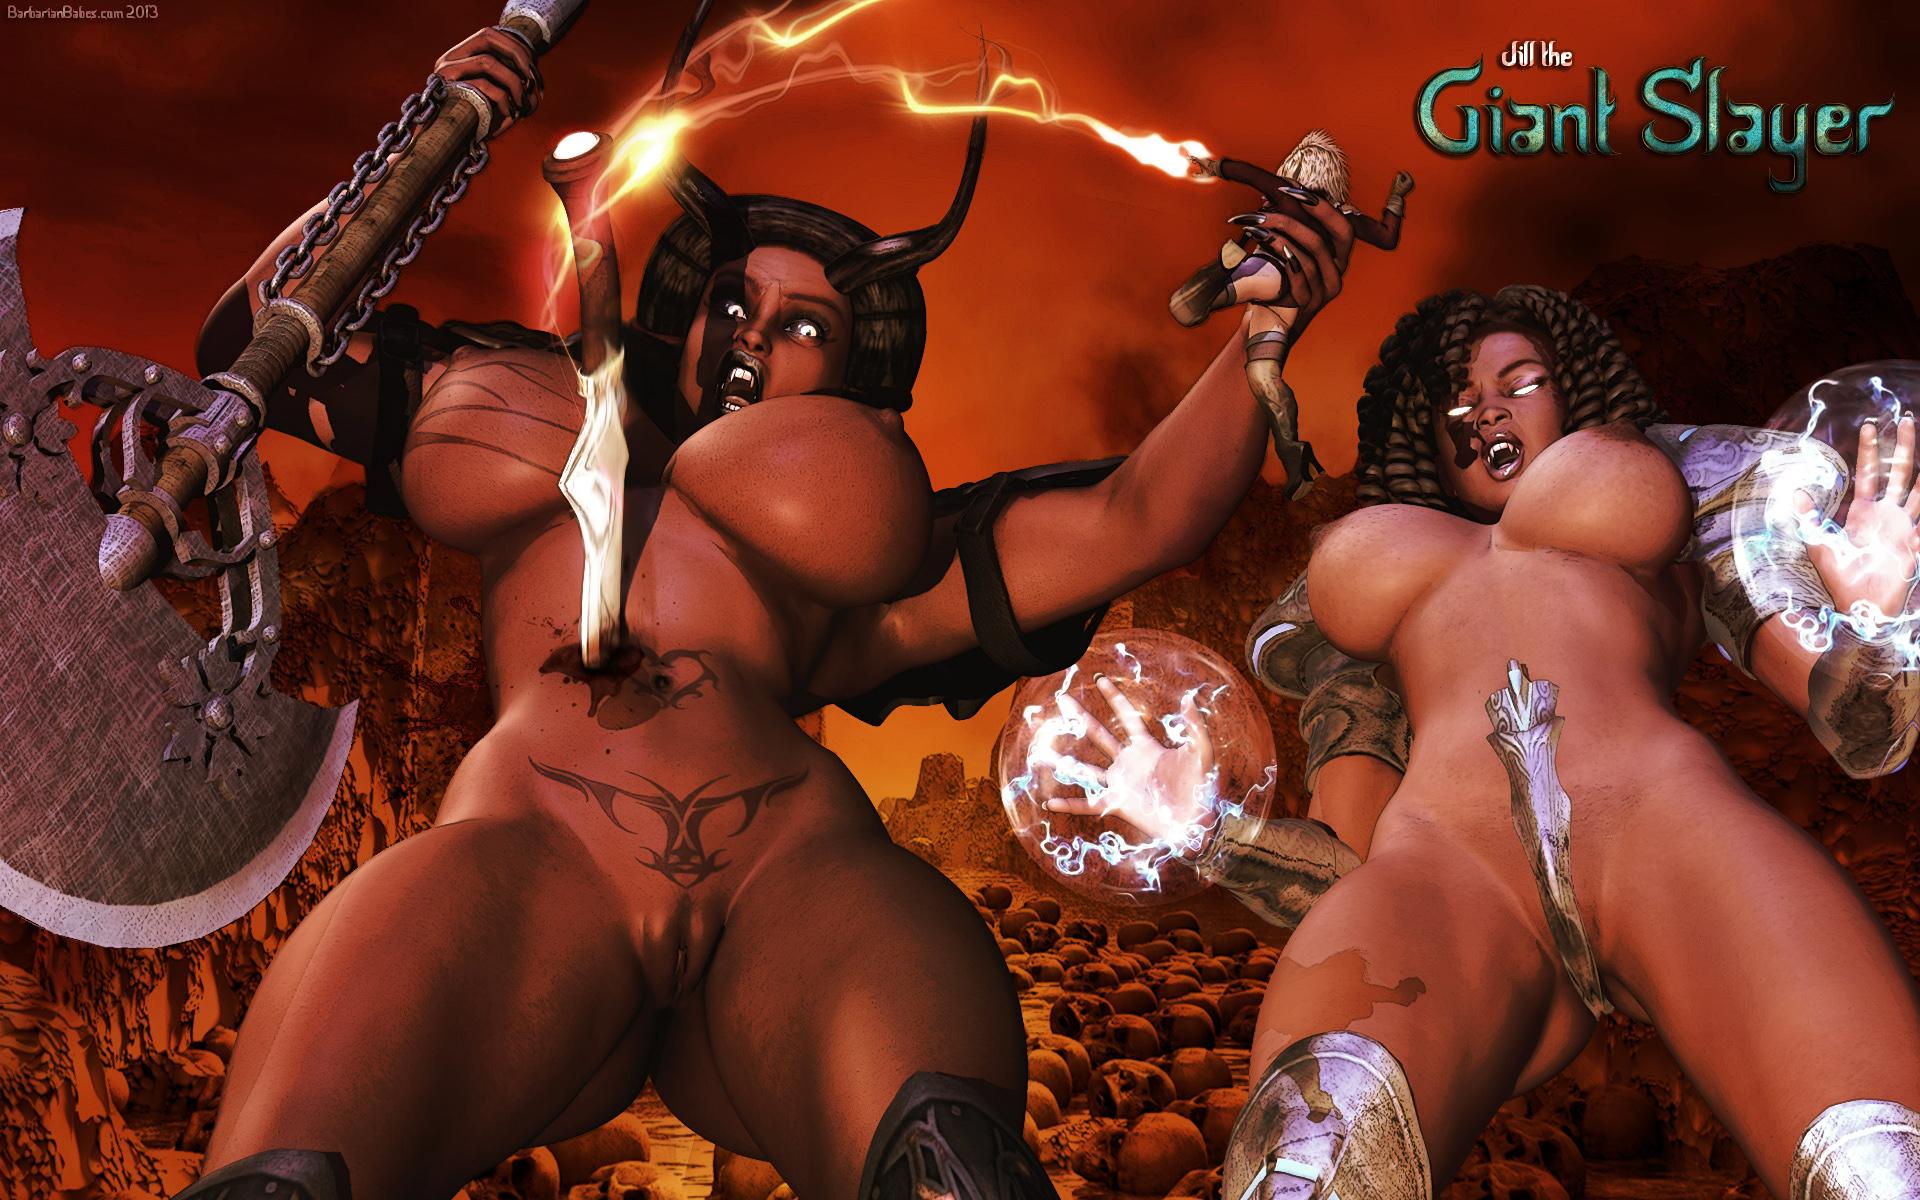 Jill the Giant Slayer